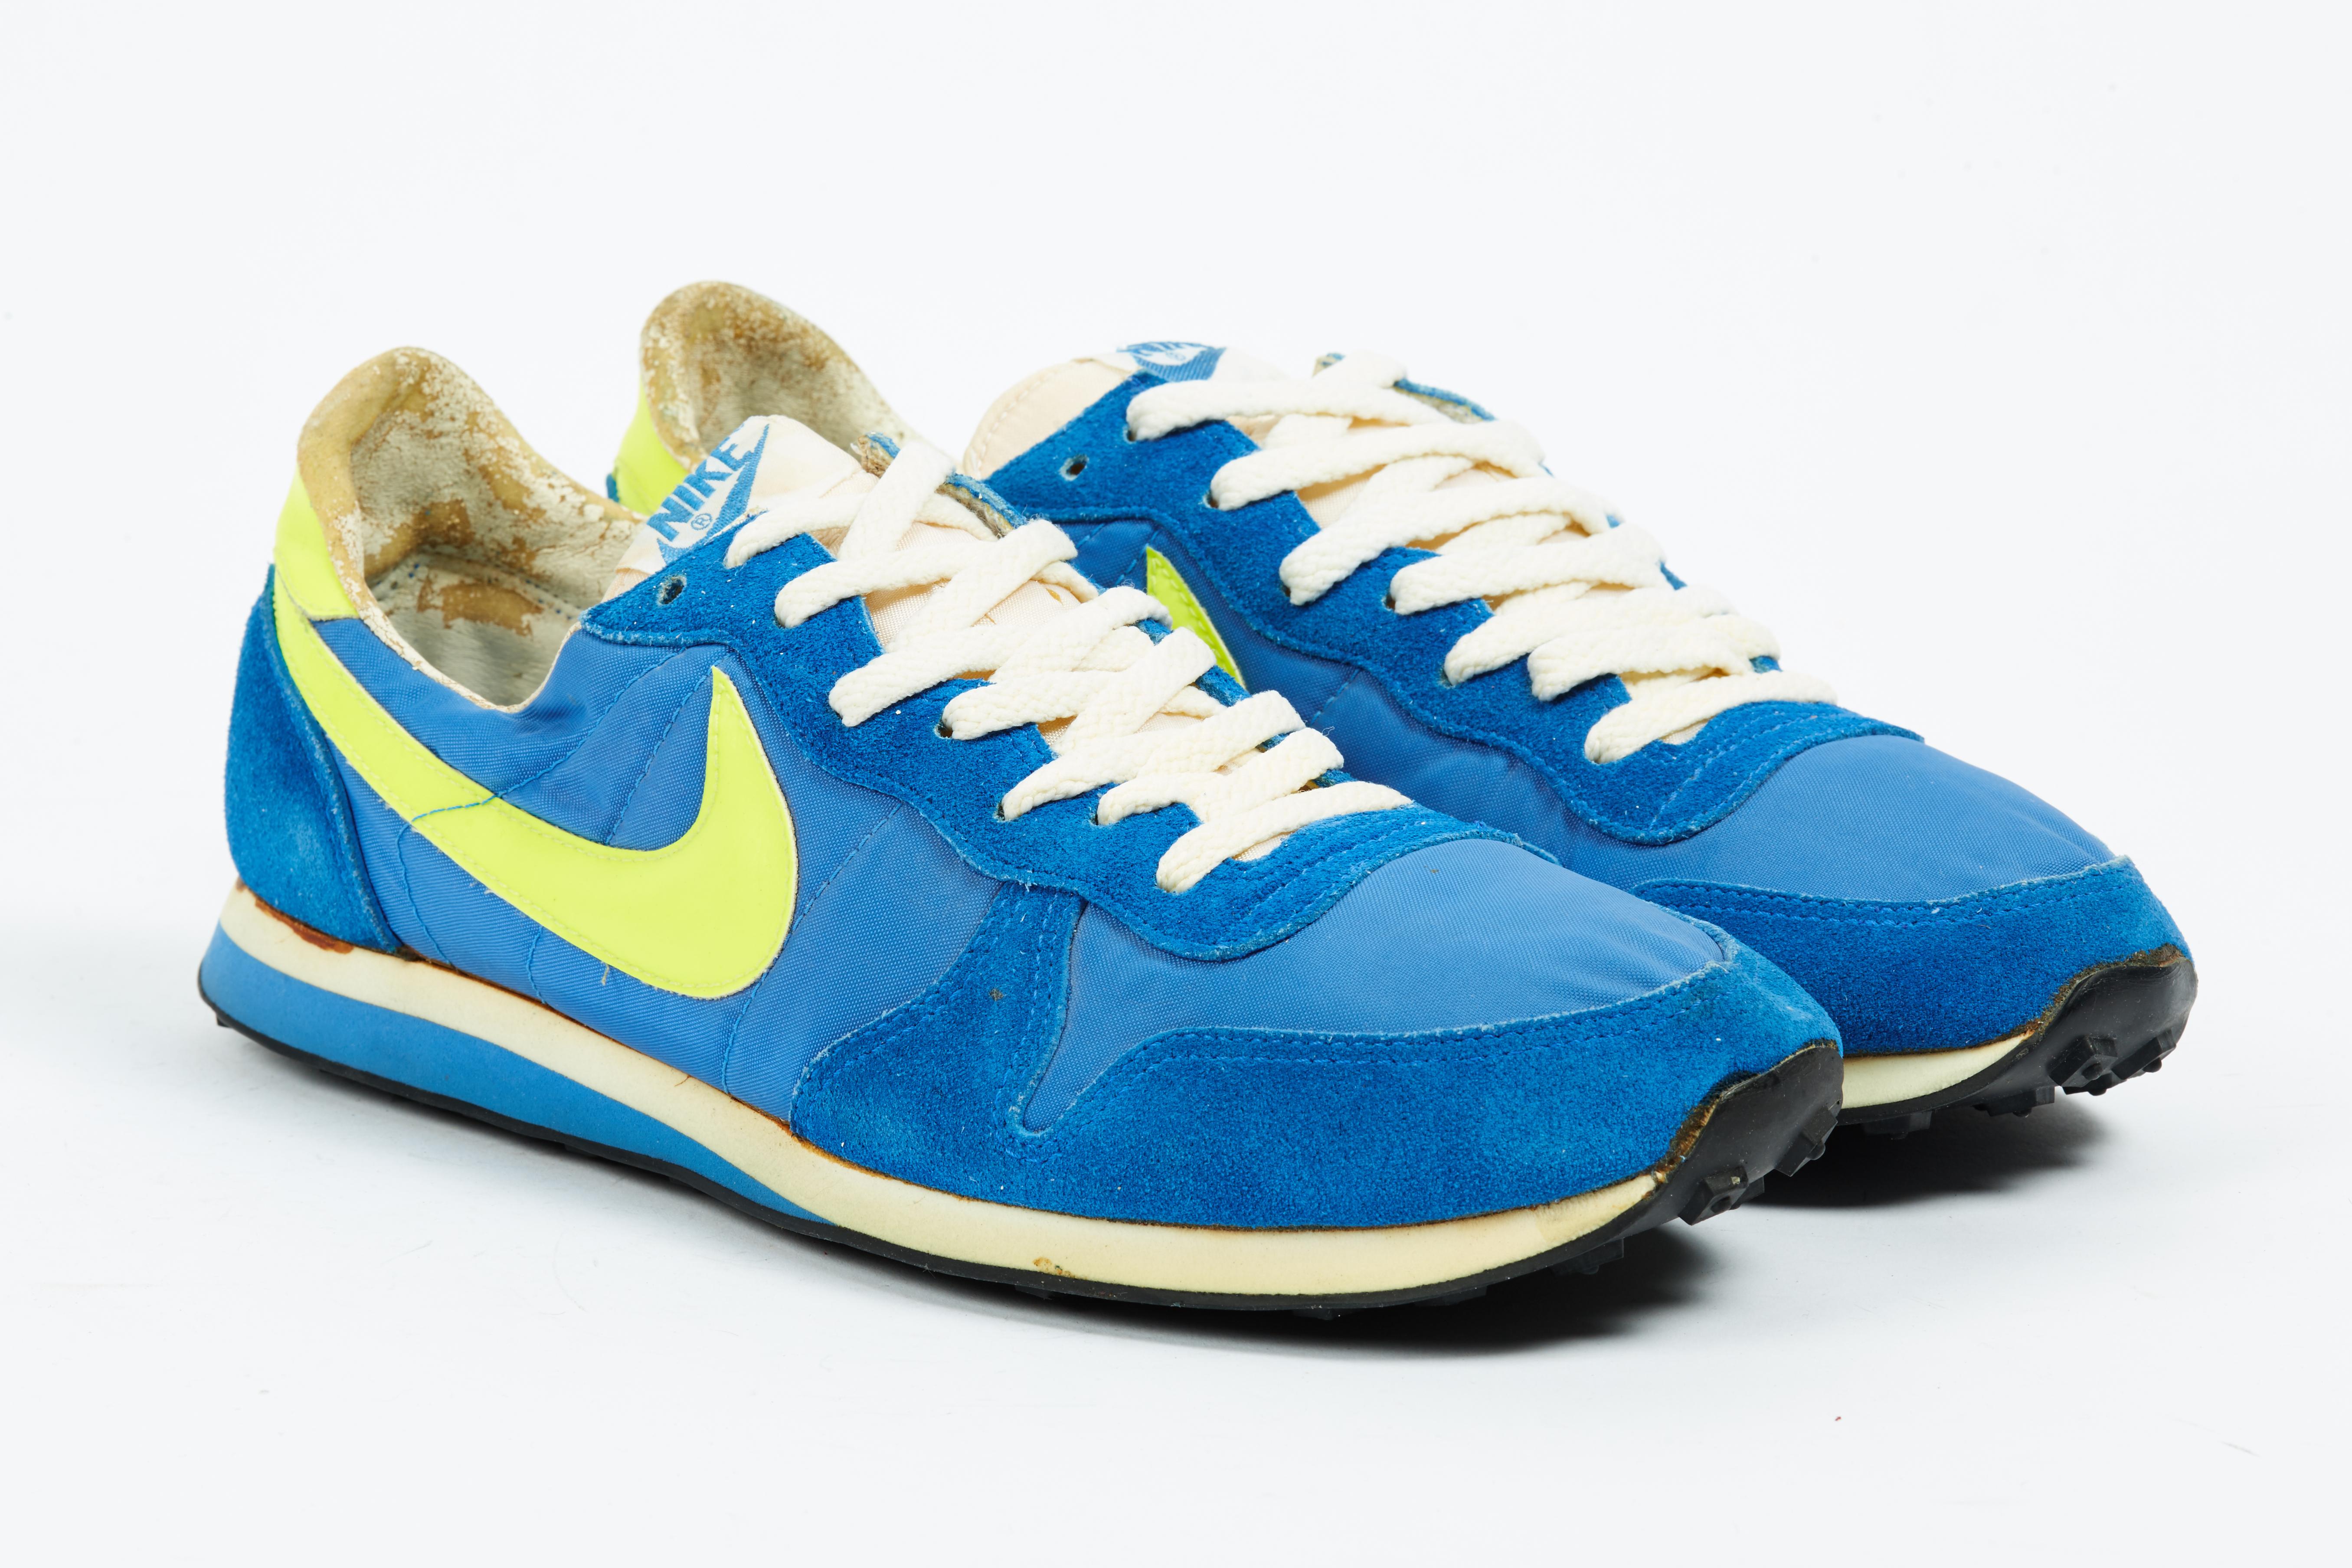 Vintage 1982 Nike Elite II - Shoes Your